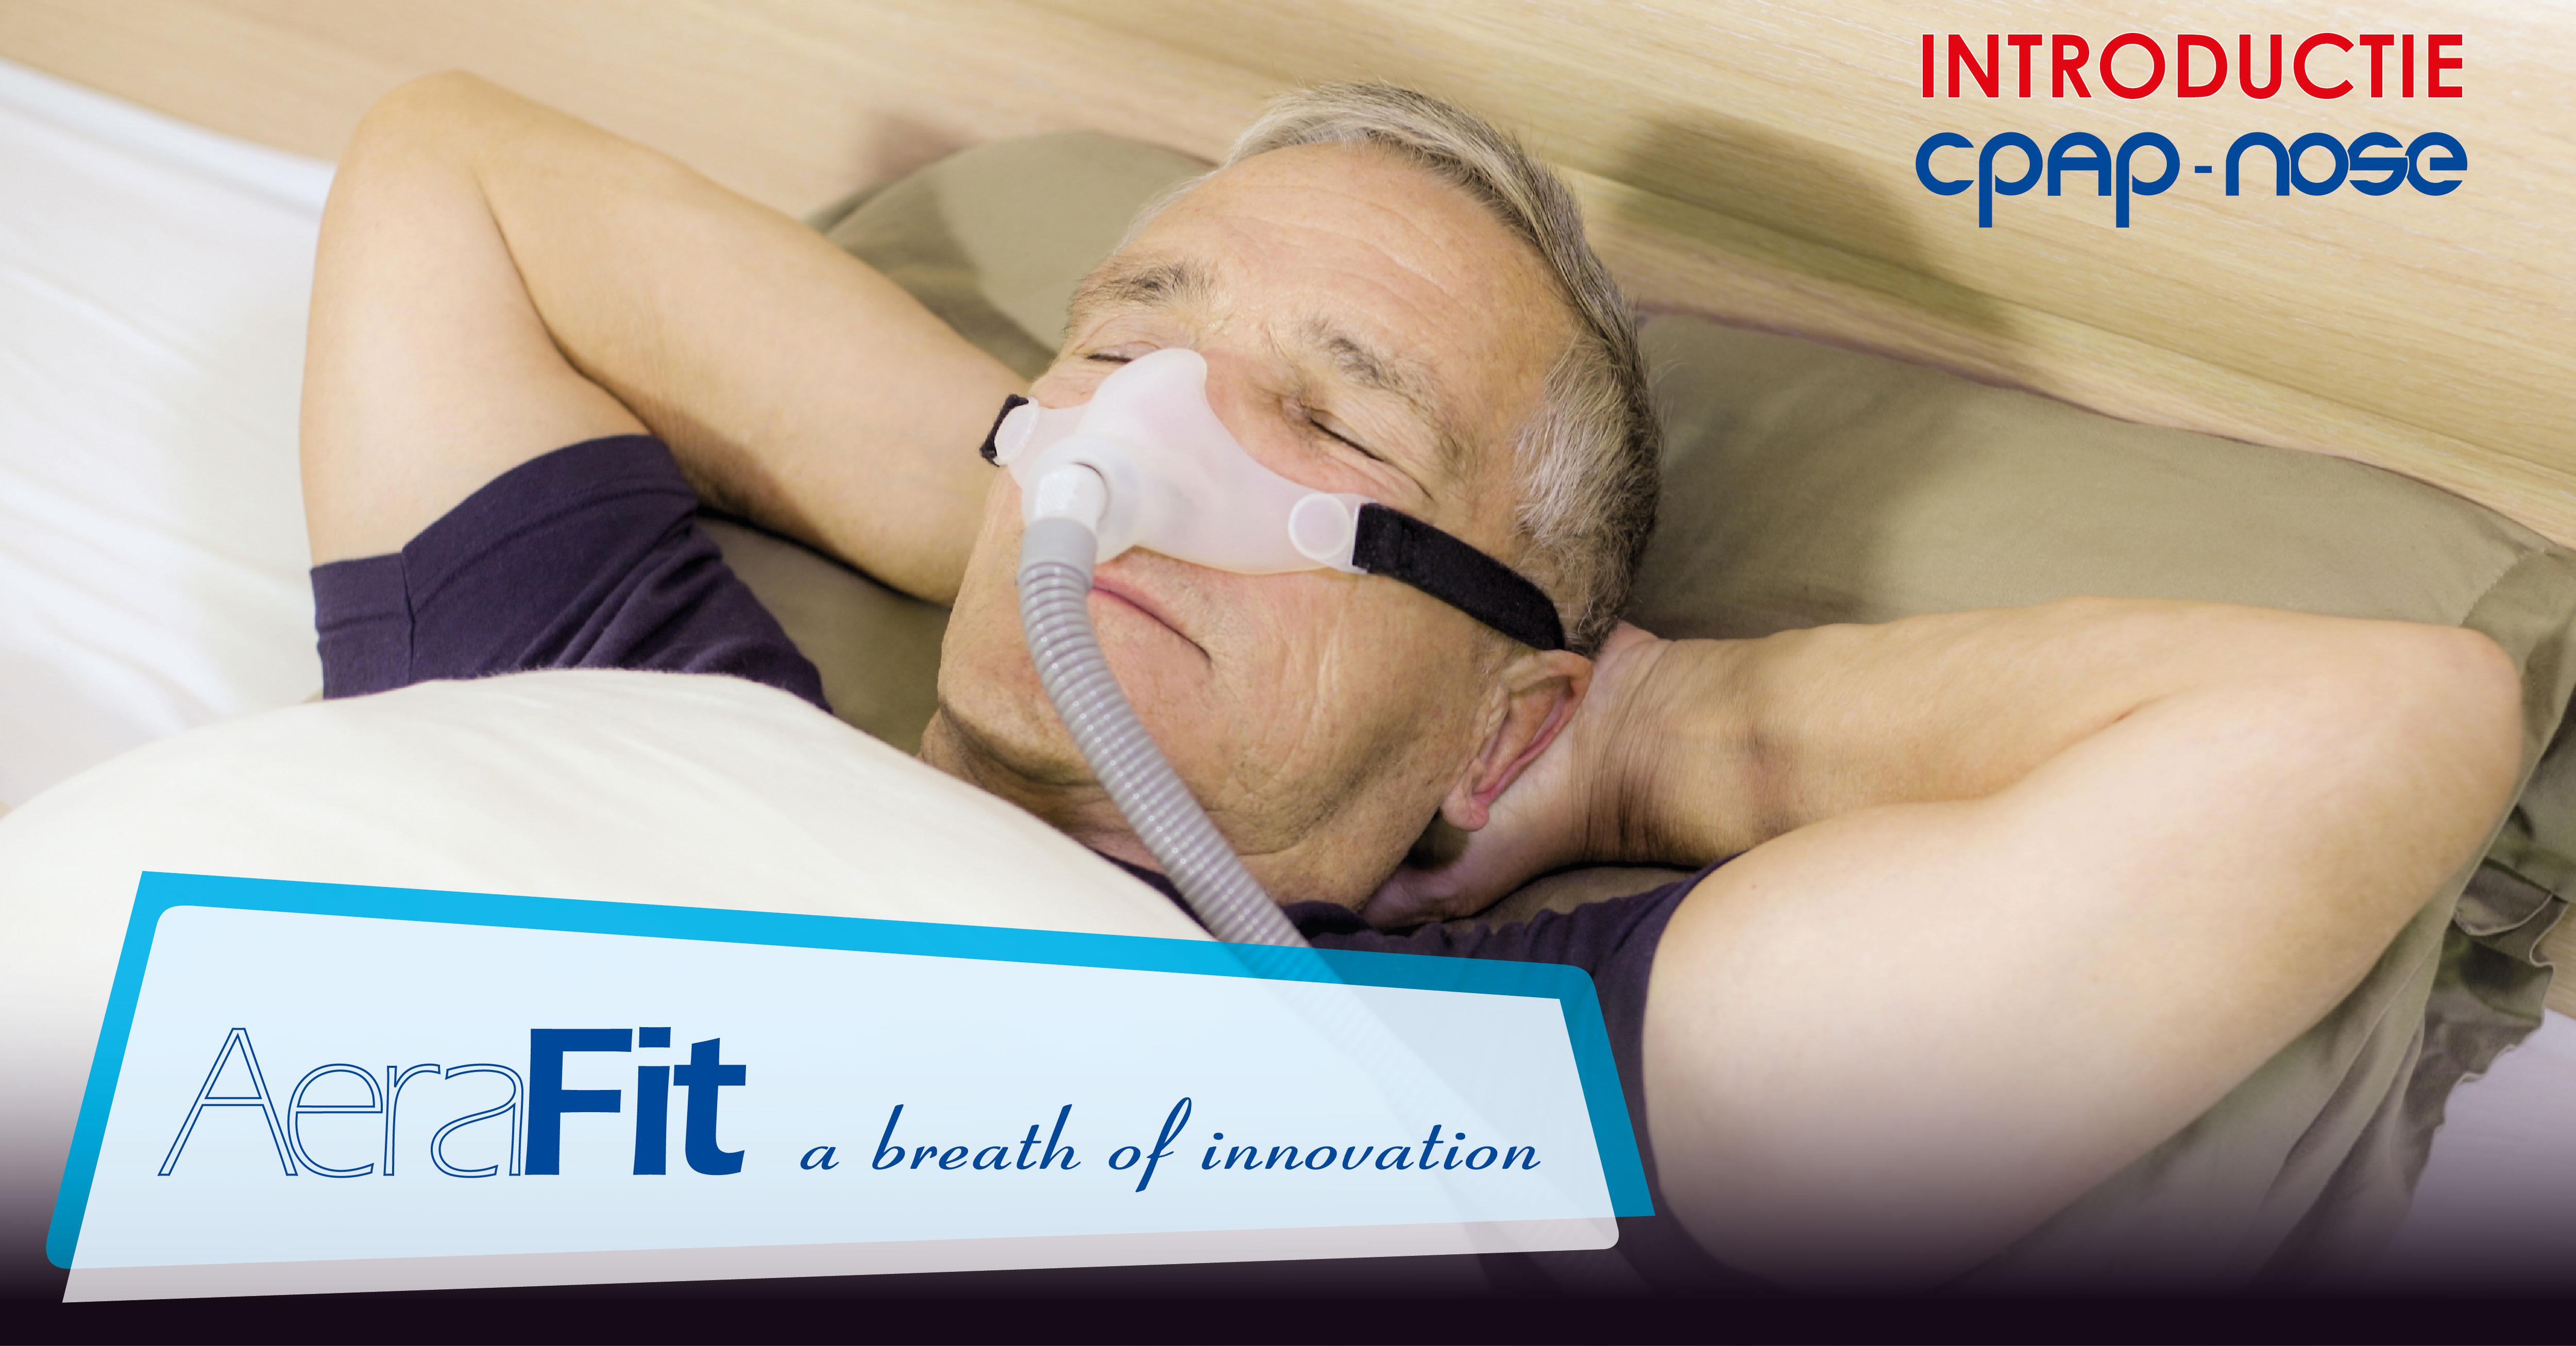 Slaaptherapie, CPAP, 3D, Masker, Actie, Introductie, APNEU, apneuvereniging, osas, csas,